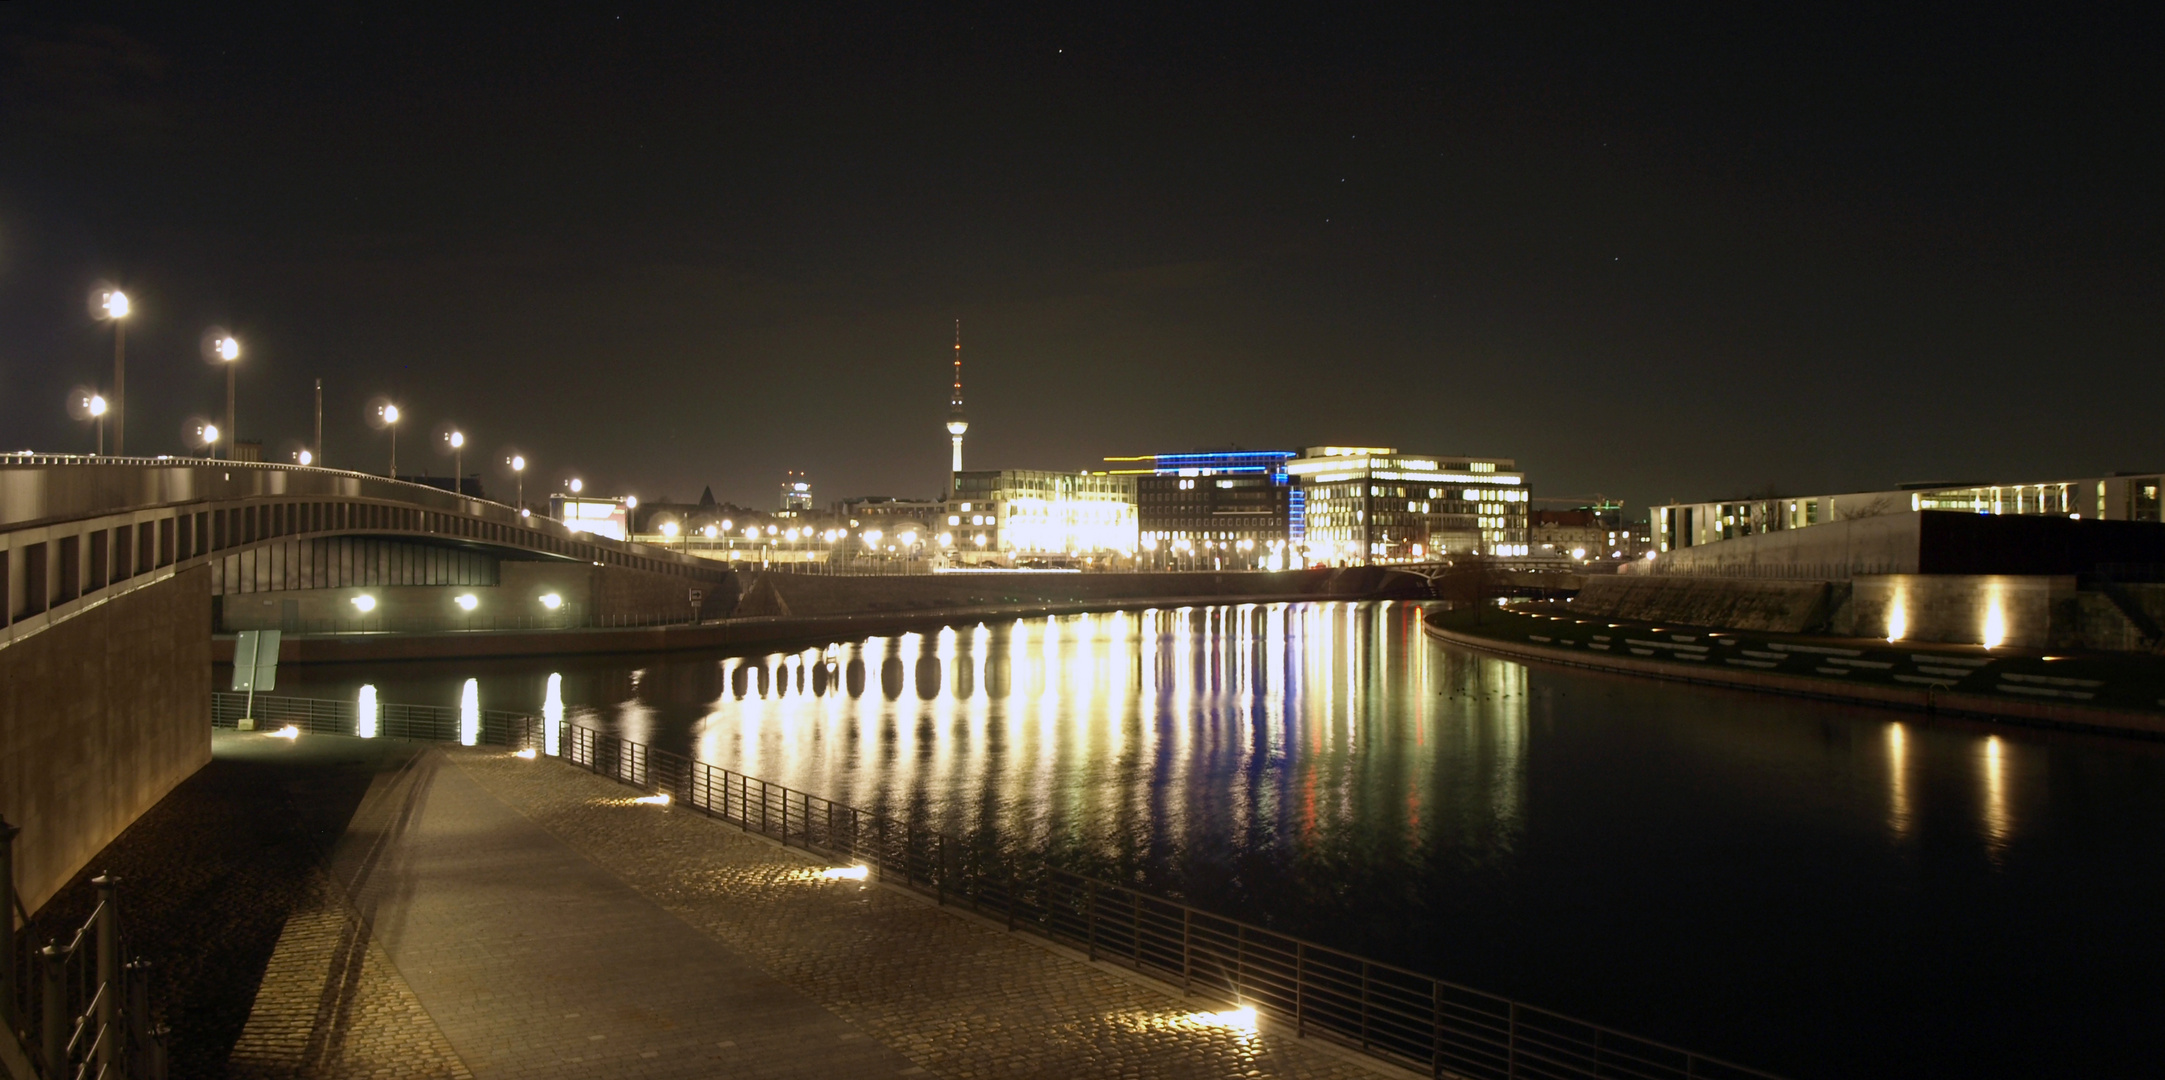 Berlin City Lights 2012